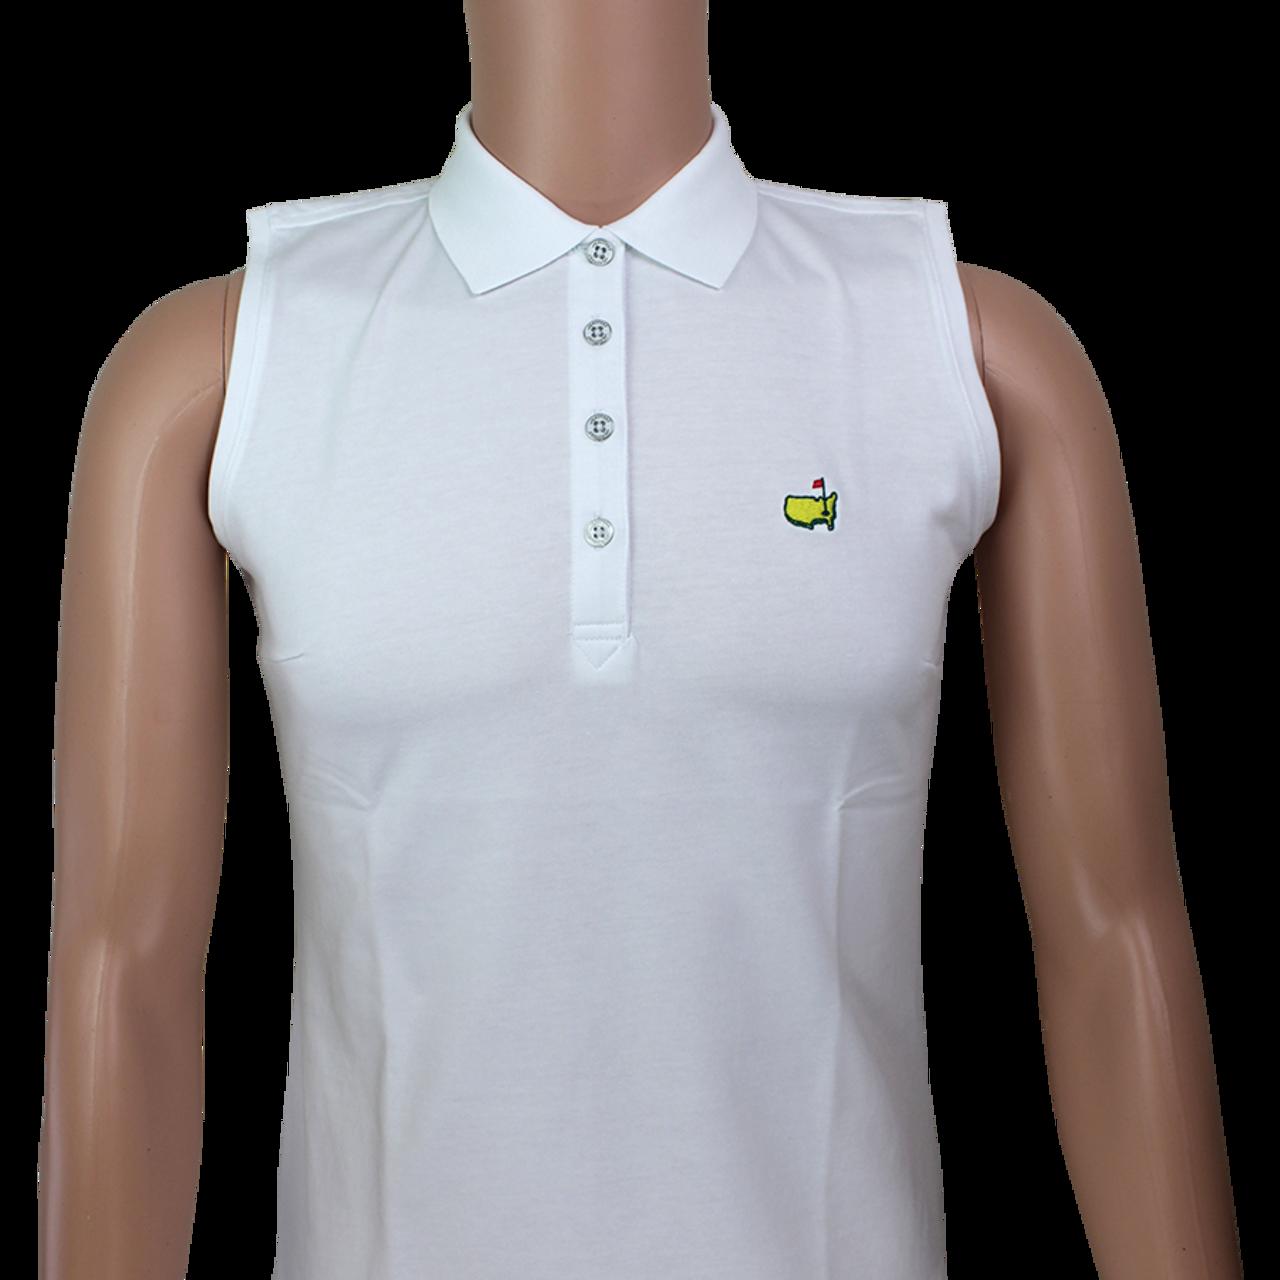 c872c4ae Masters Magnolia Lane Ladies Performance Tech Sleeveless Golf Shirt